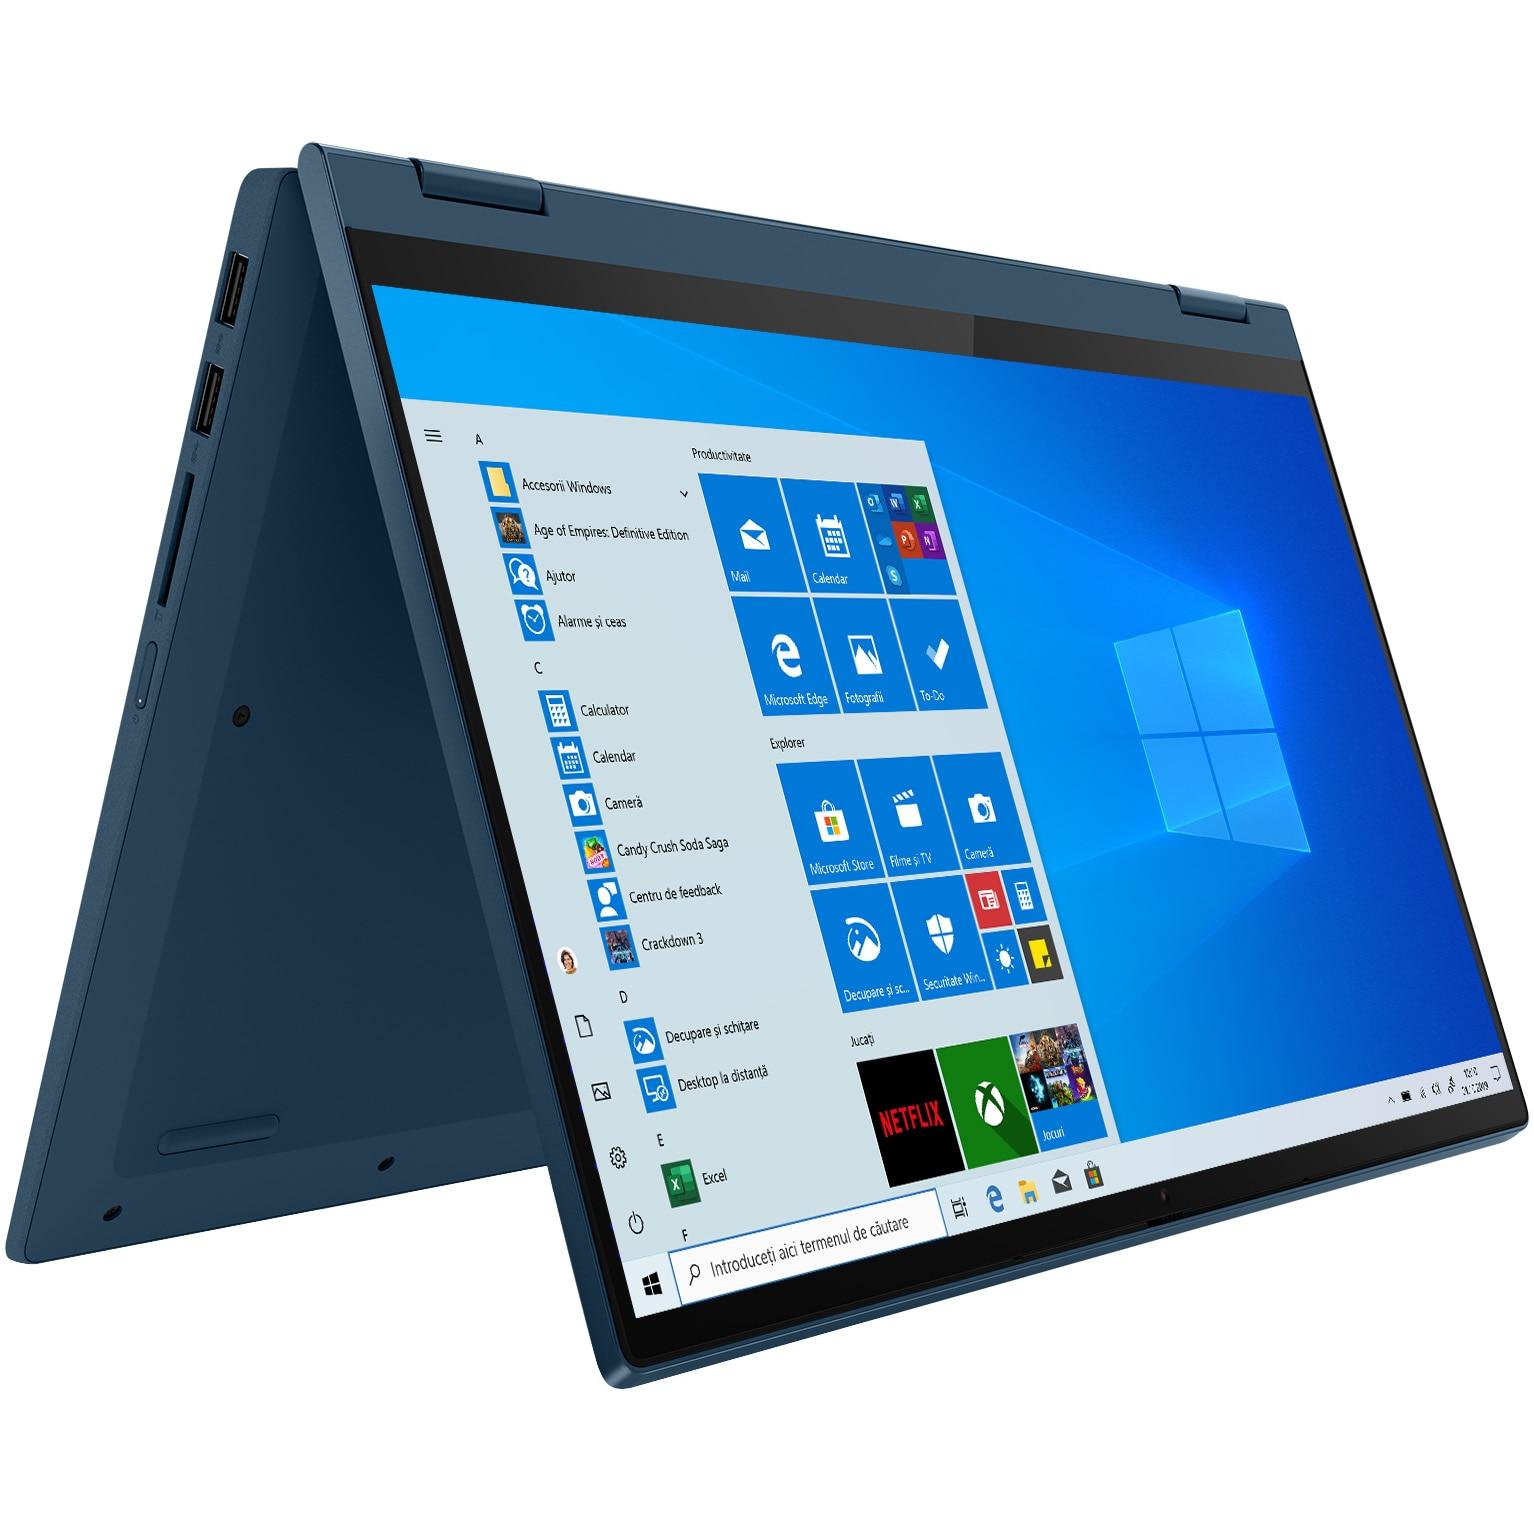 "Fotografie Laptop 2 in 1 Lenovo IdeaPad Flex 5 14ALC05 cu procesor AMD Ryzen 7 5700U pana la 4.30 GHz, 14"", Full HD, Touch, 16GB, 512GB SSD, AMD Radeon Graphics, Windows 10 Home, Abyss Blue"